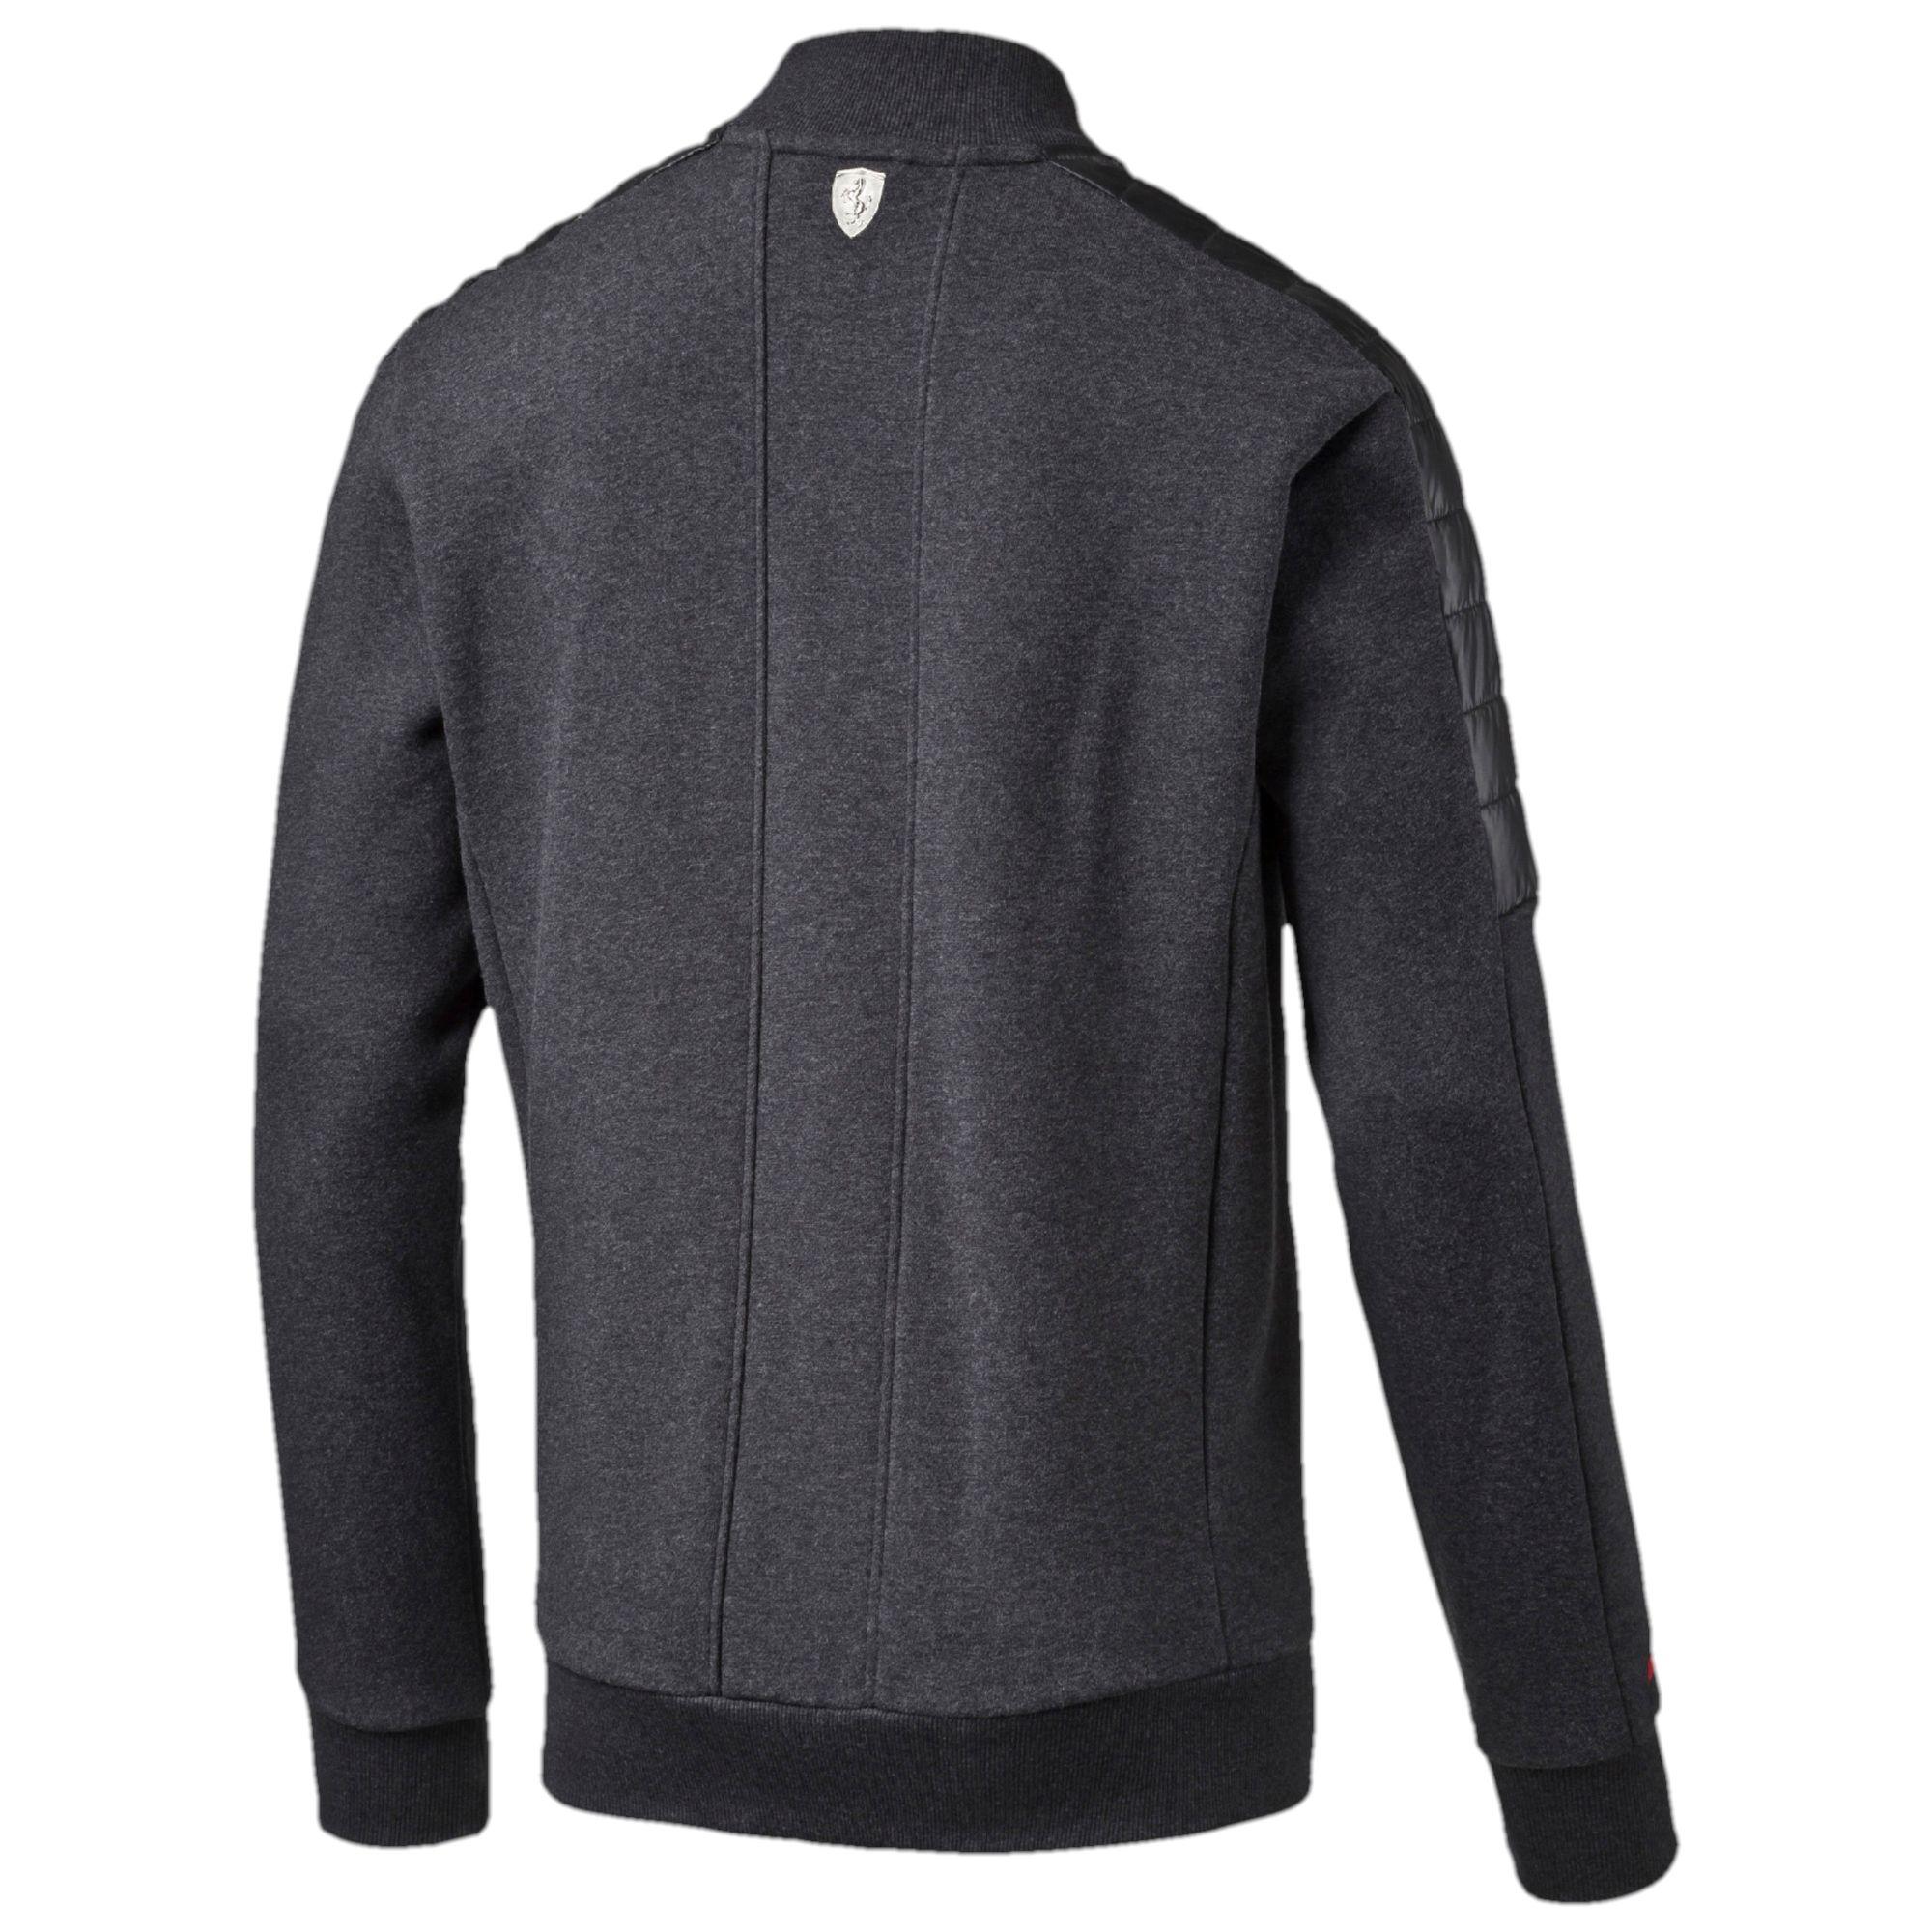 puma ferrari sweat jacket apparel sweatshirts hoodies. Black Bedroom Furniture Sets. Home Design Ideas